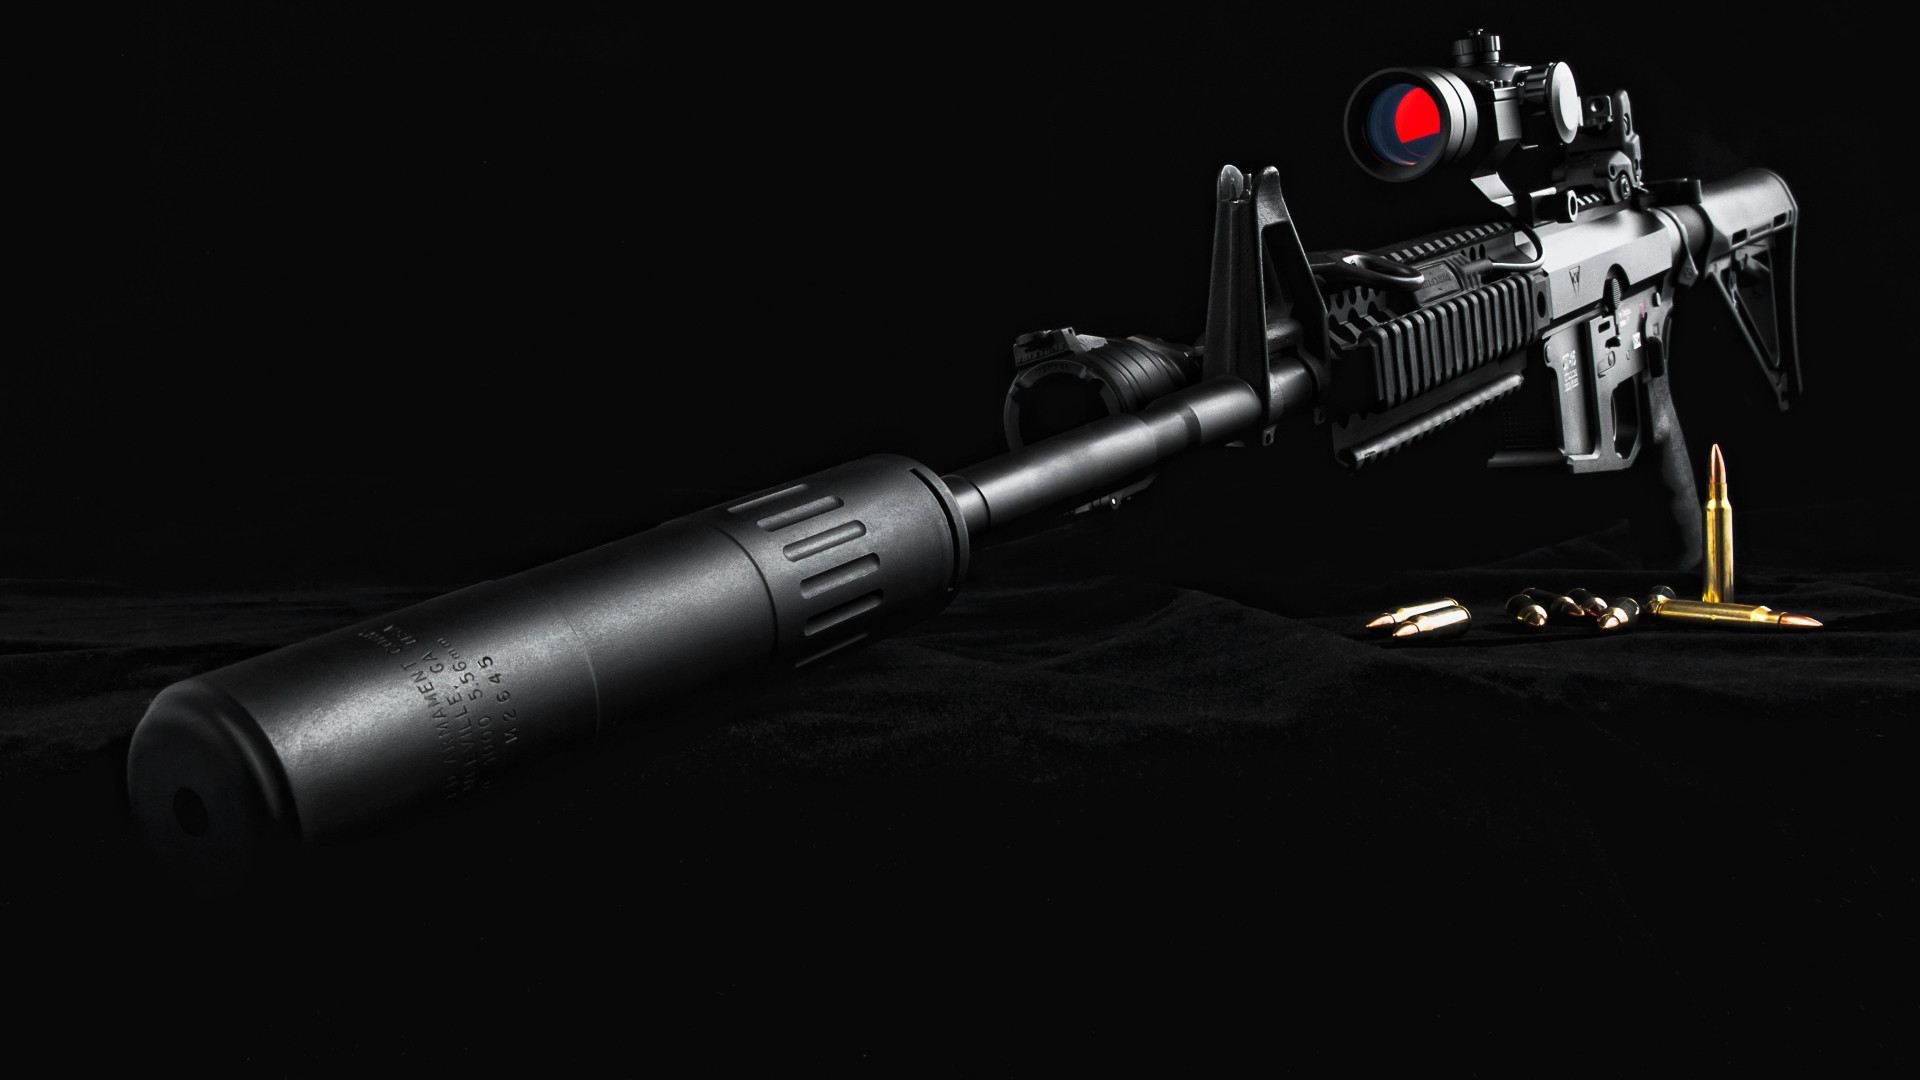 Sniper Wallpaper Background 8183